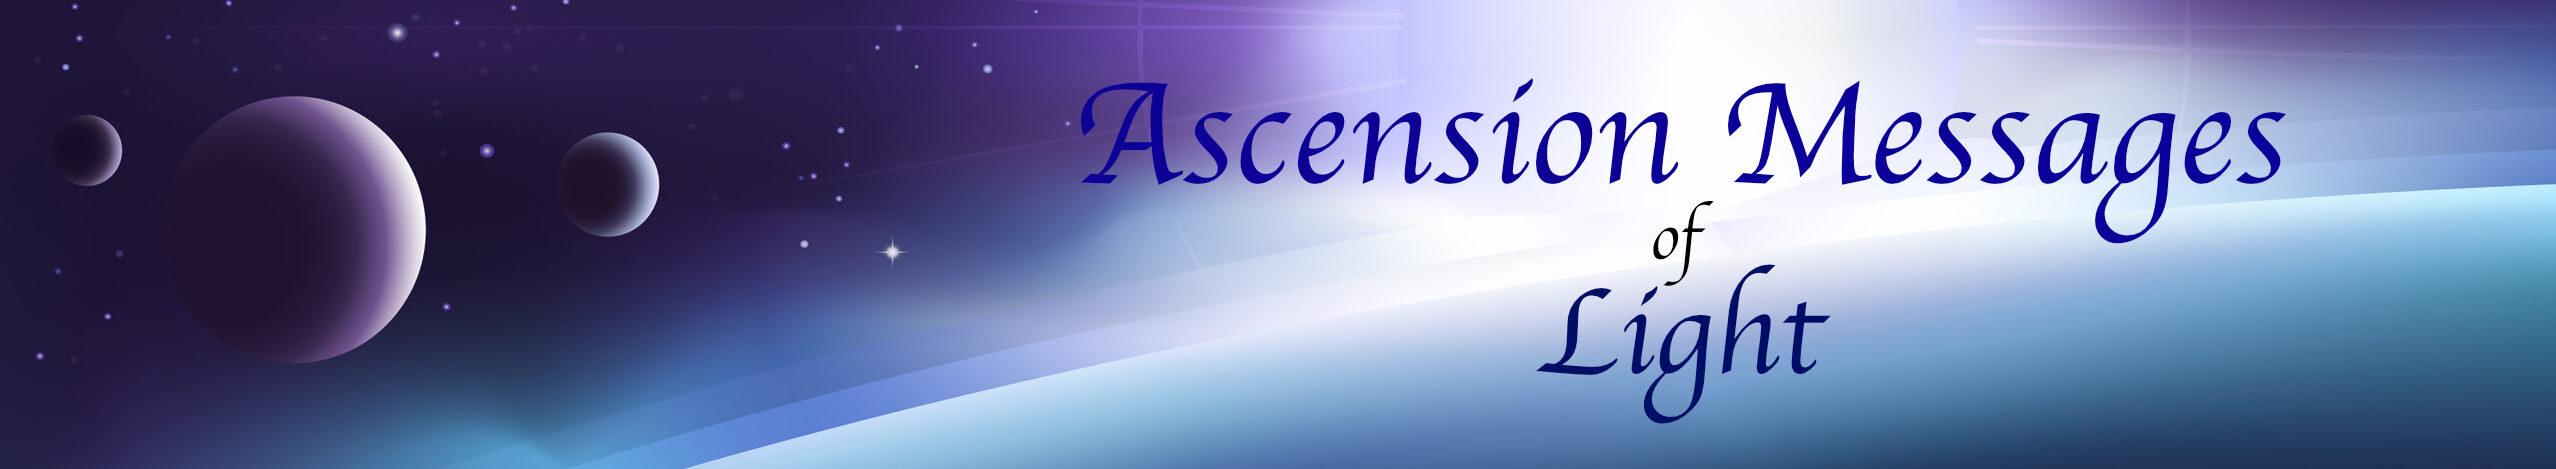 Ascension Messages of Light